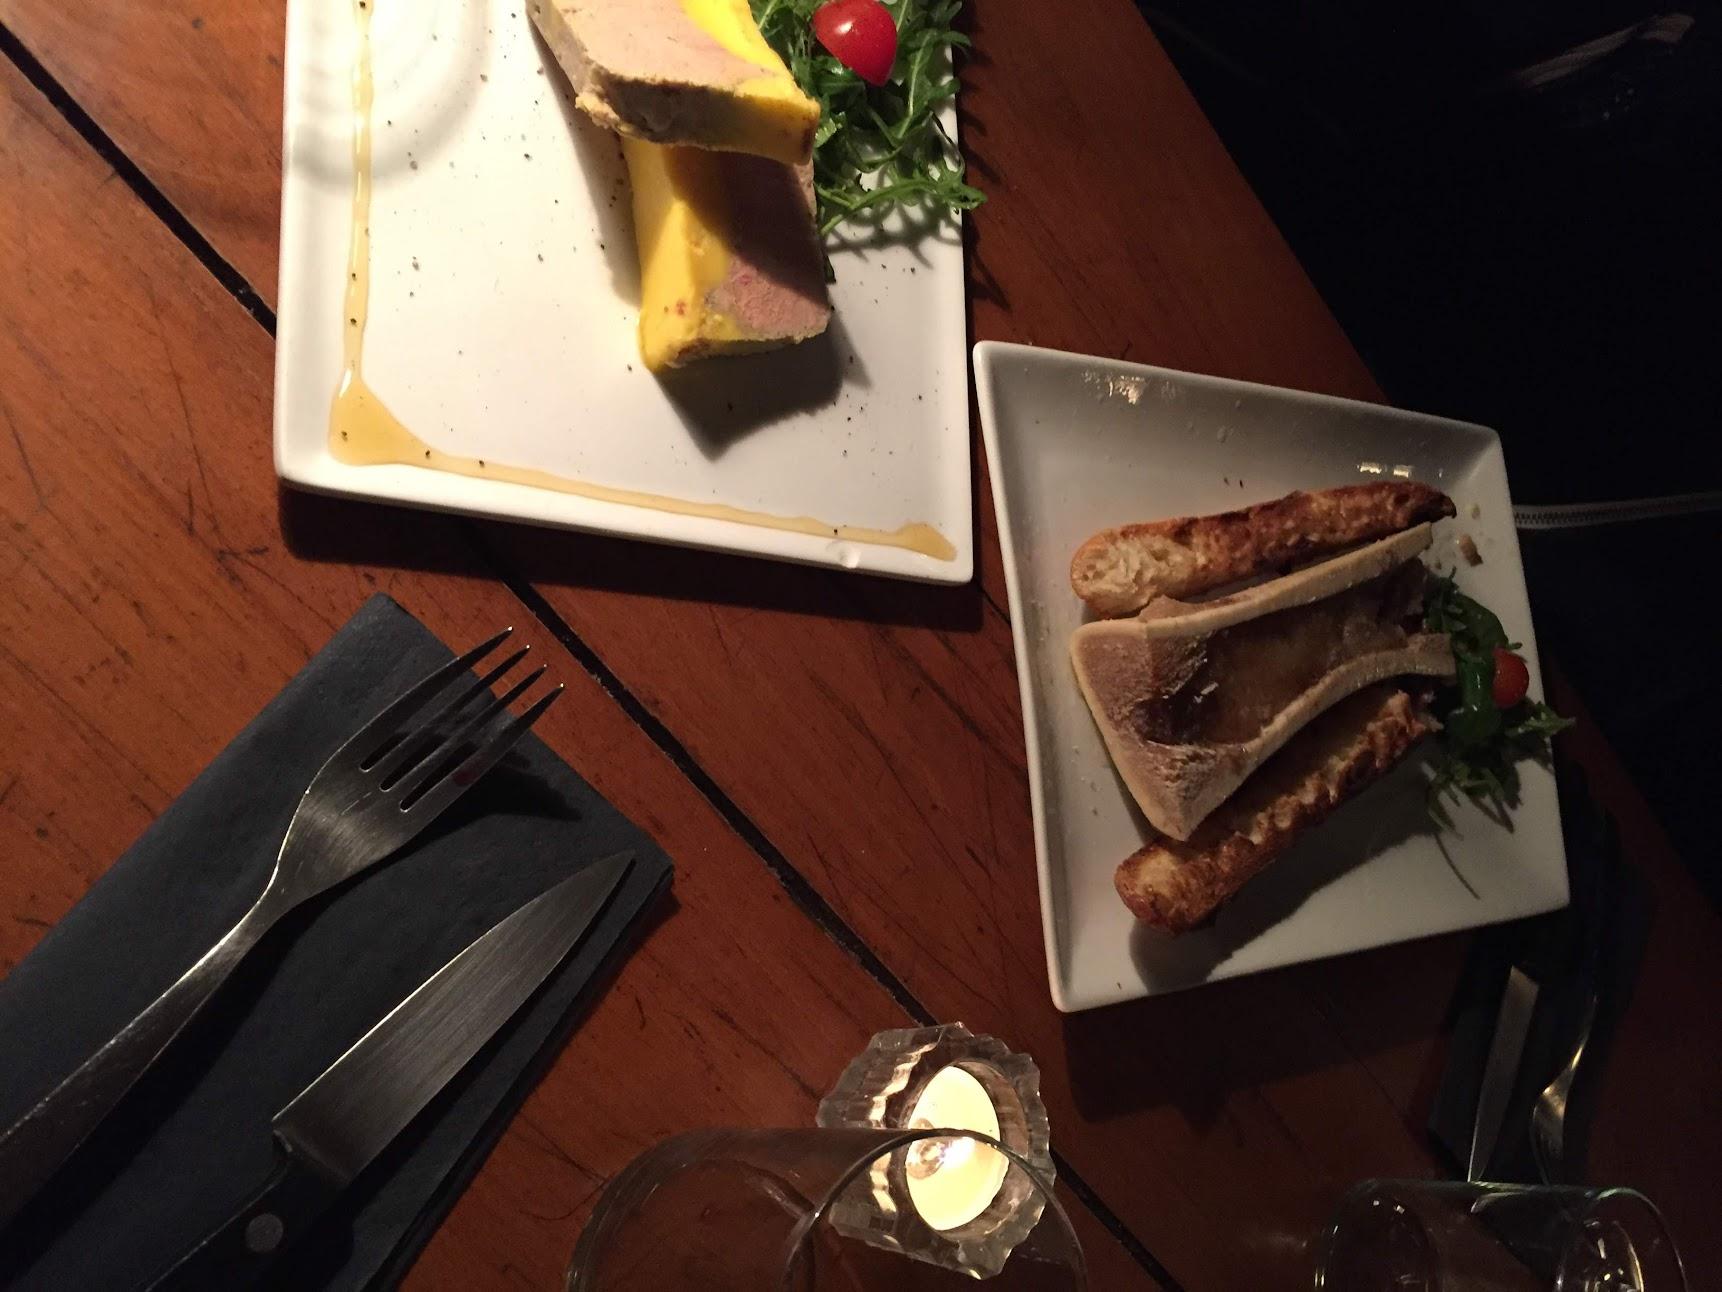 L'aller Retour Steak コートドブッフ パリ ビストロ レストラン フランス料理 ラバロック Os Amoulle 骨髄のオーブン焼き フォアグラ